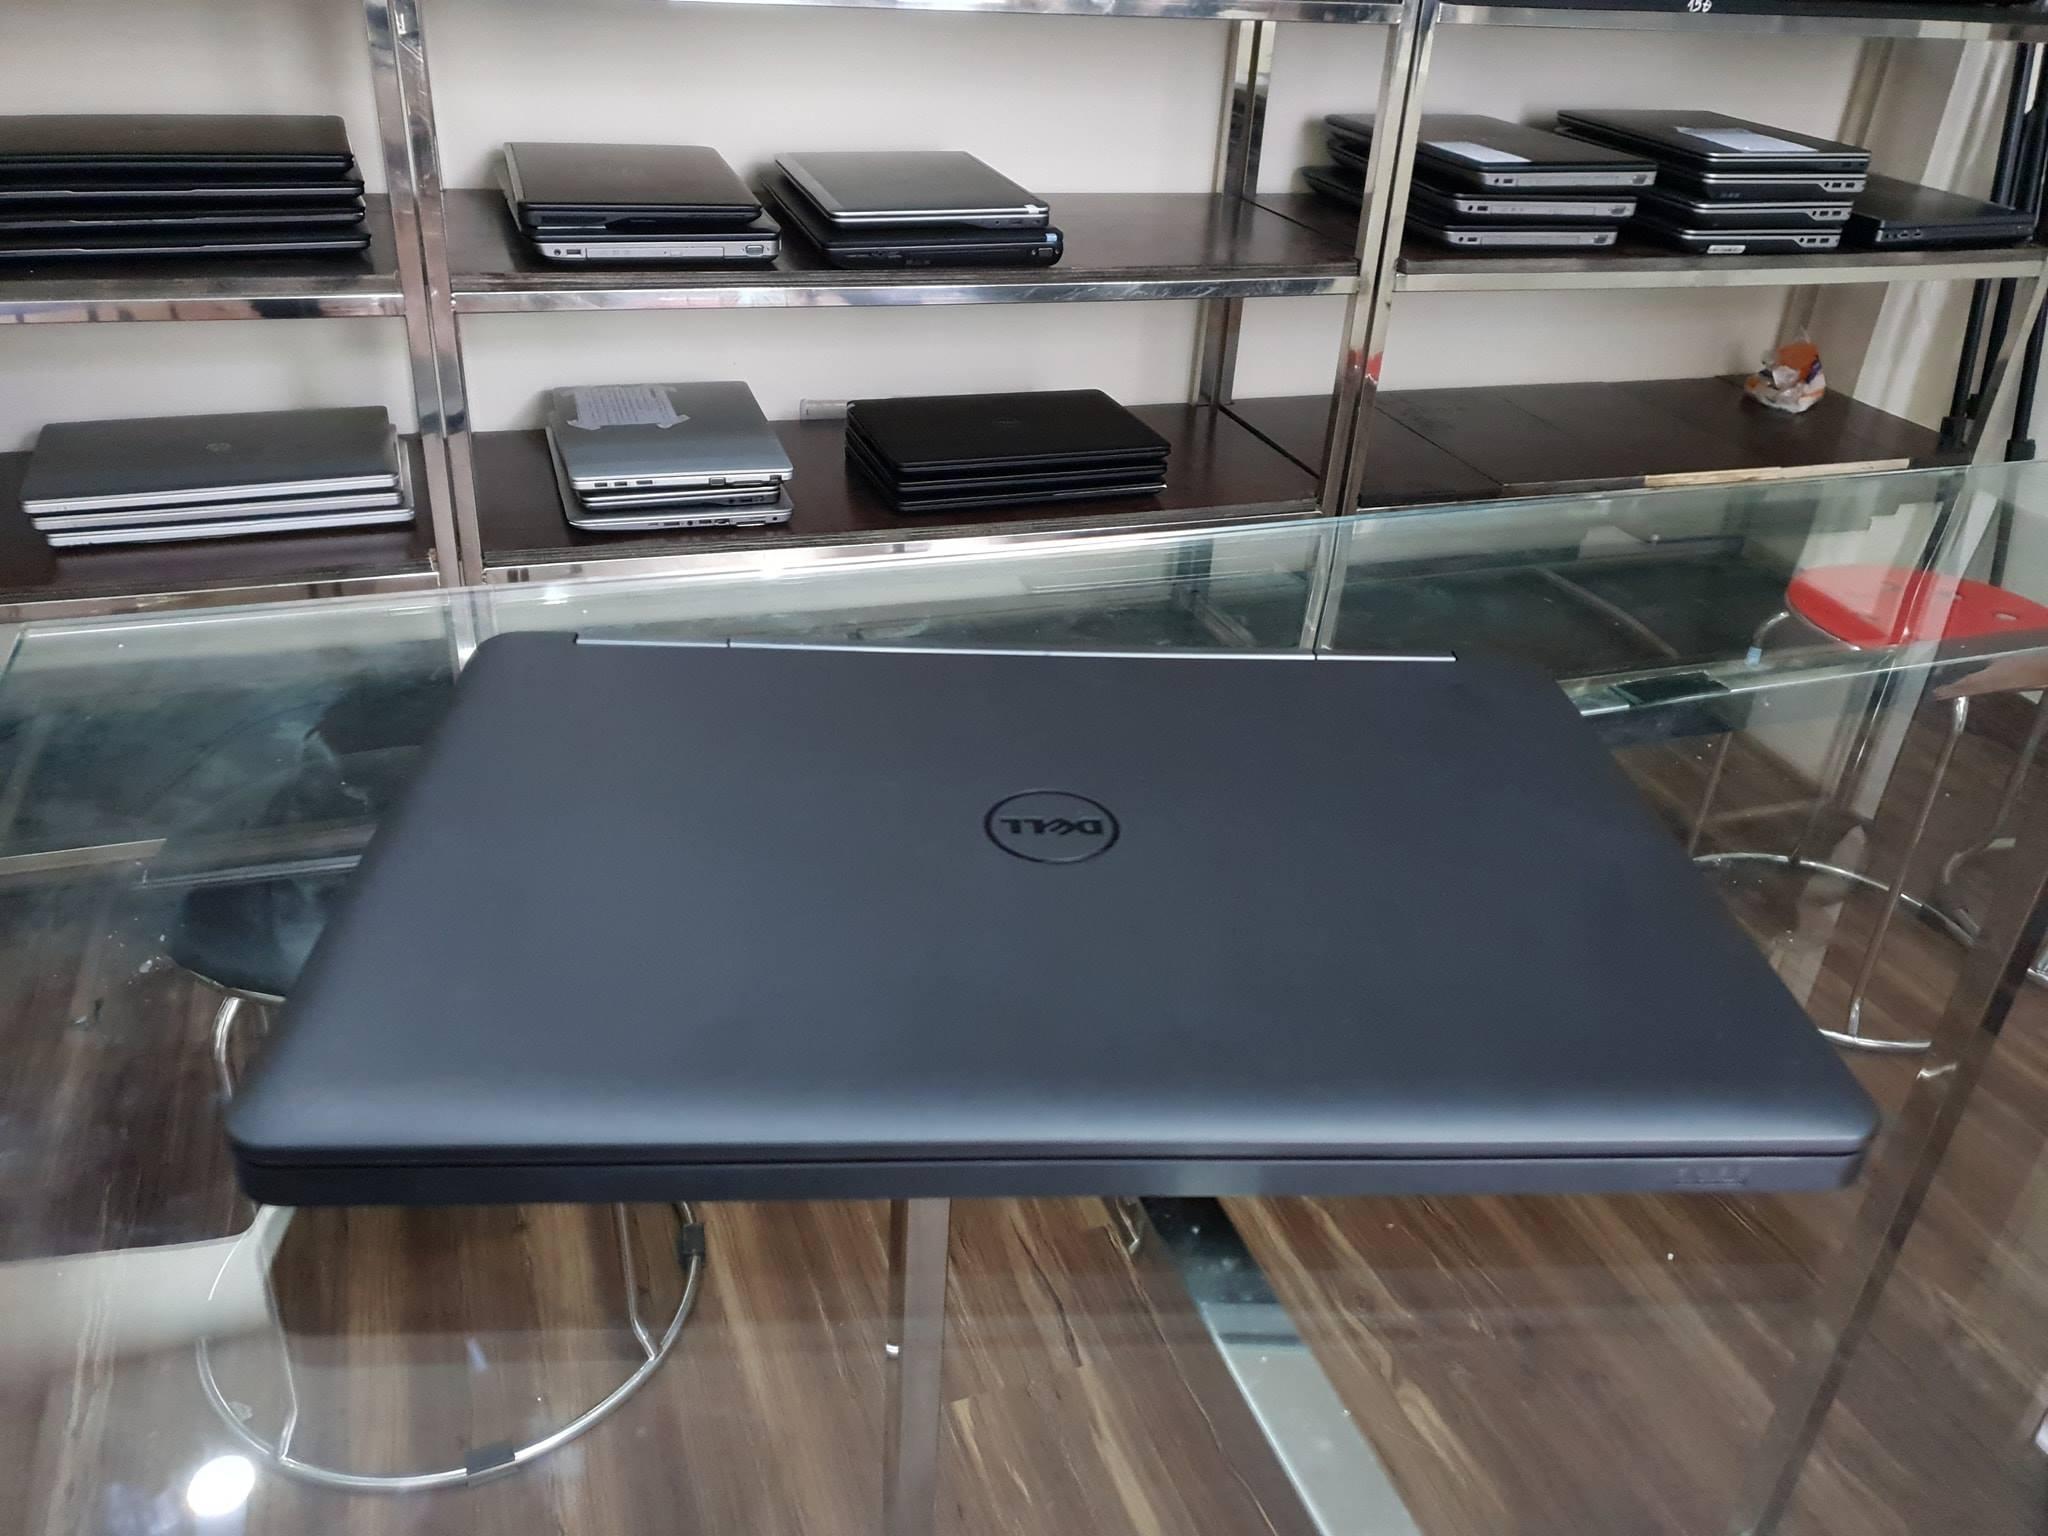 39245684 1071623573014853 8852297638553321472 o Laptop Lê Sơn